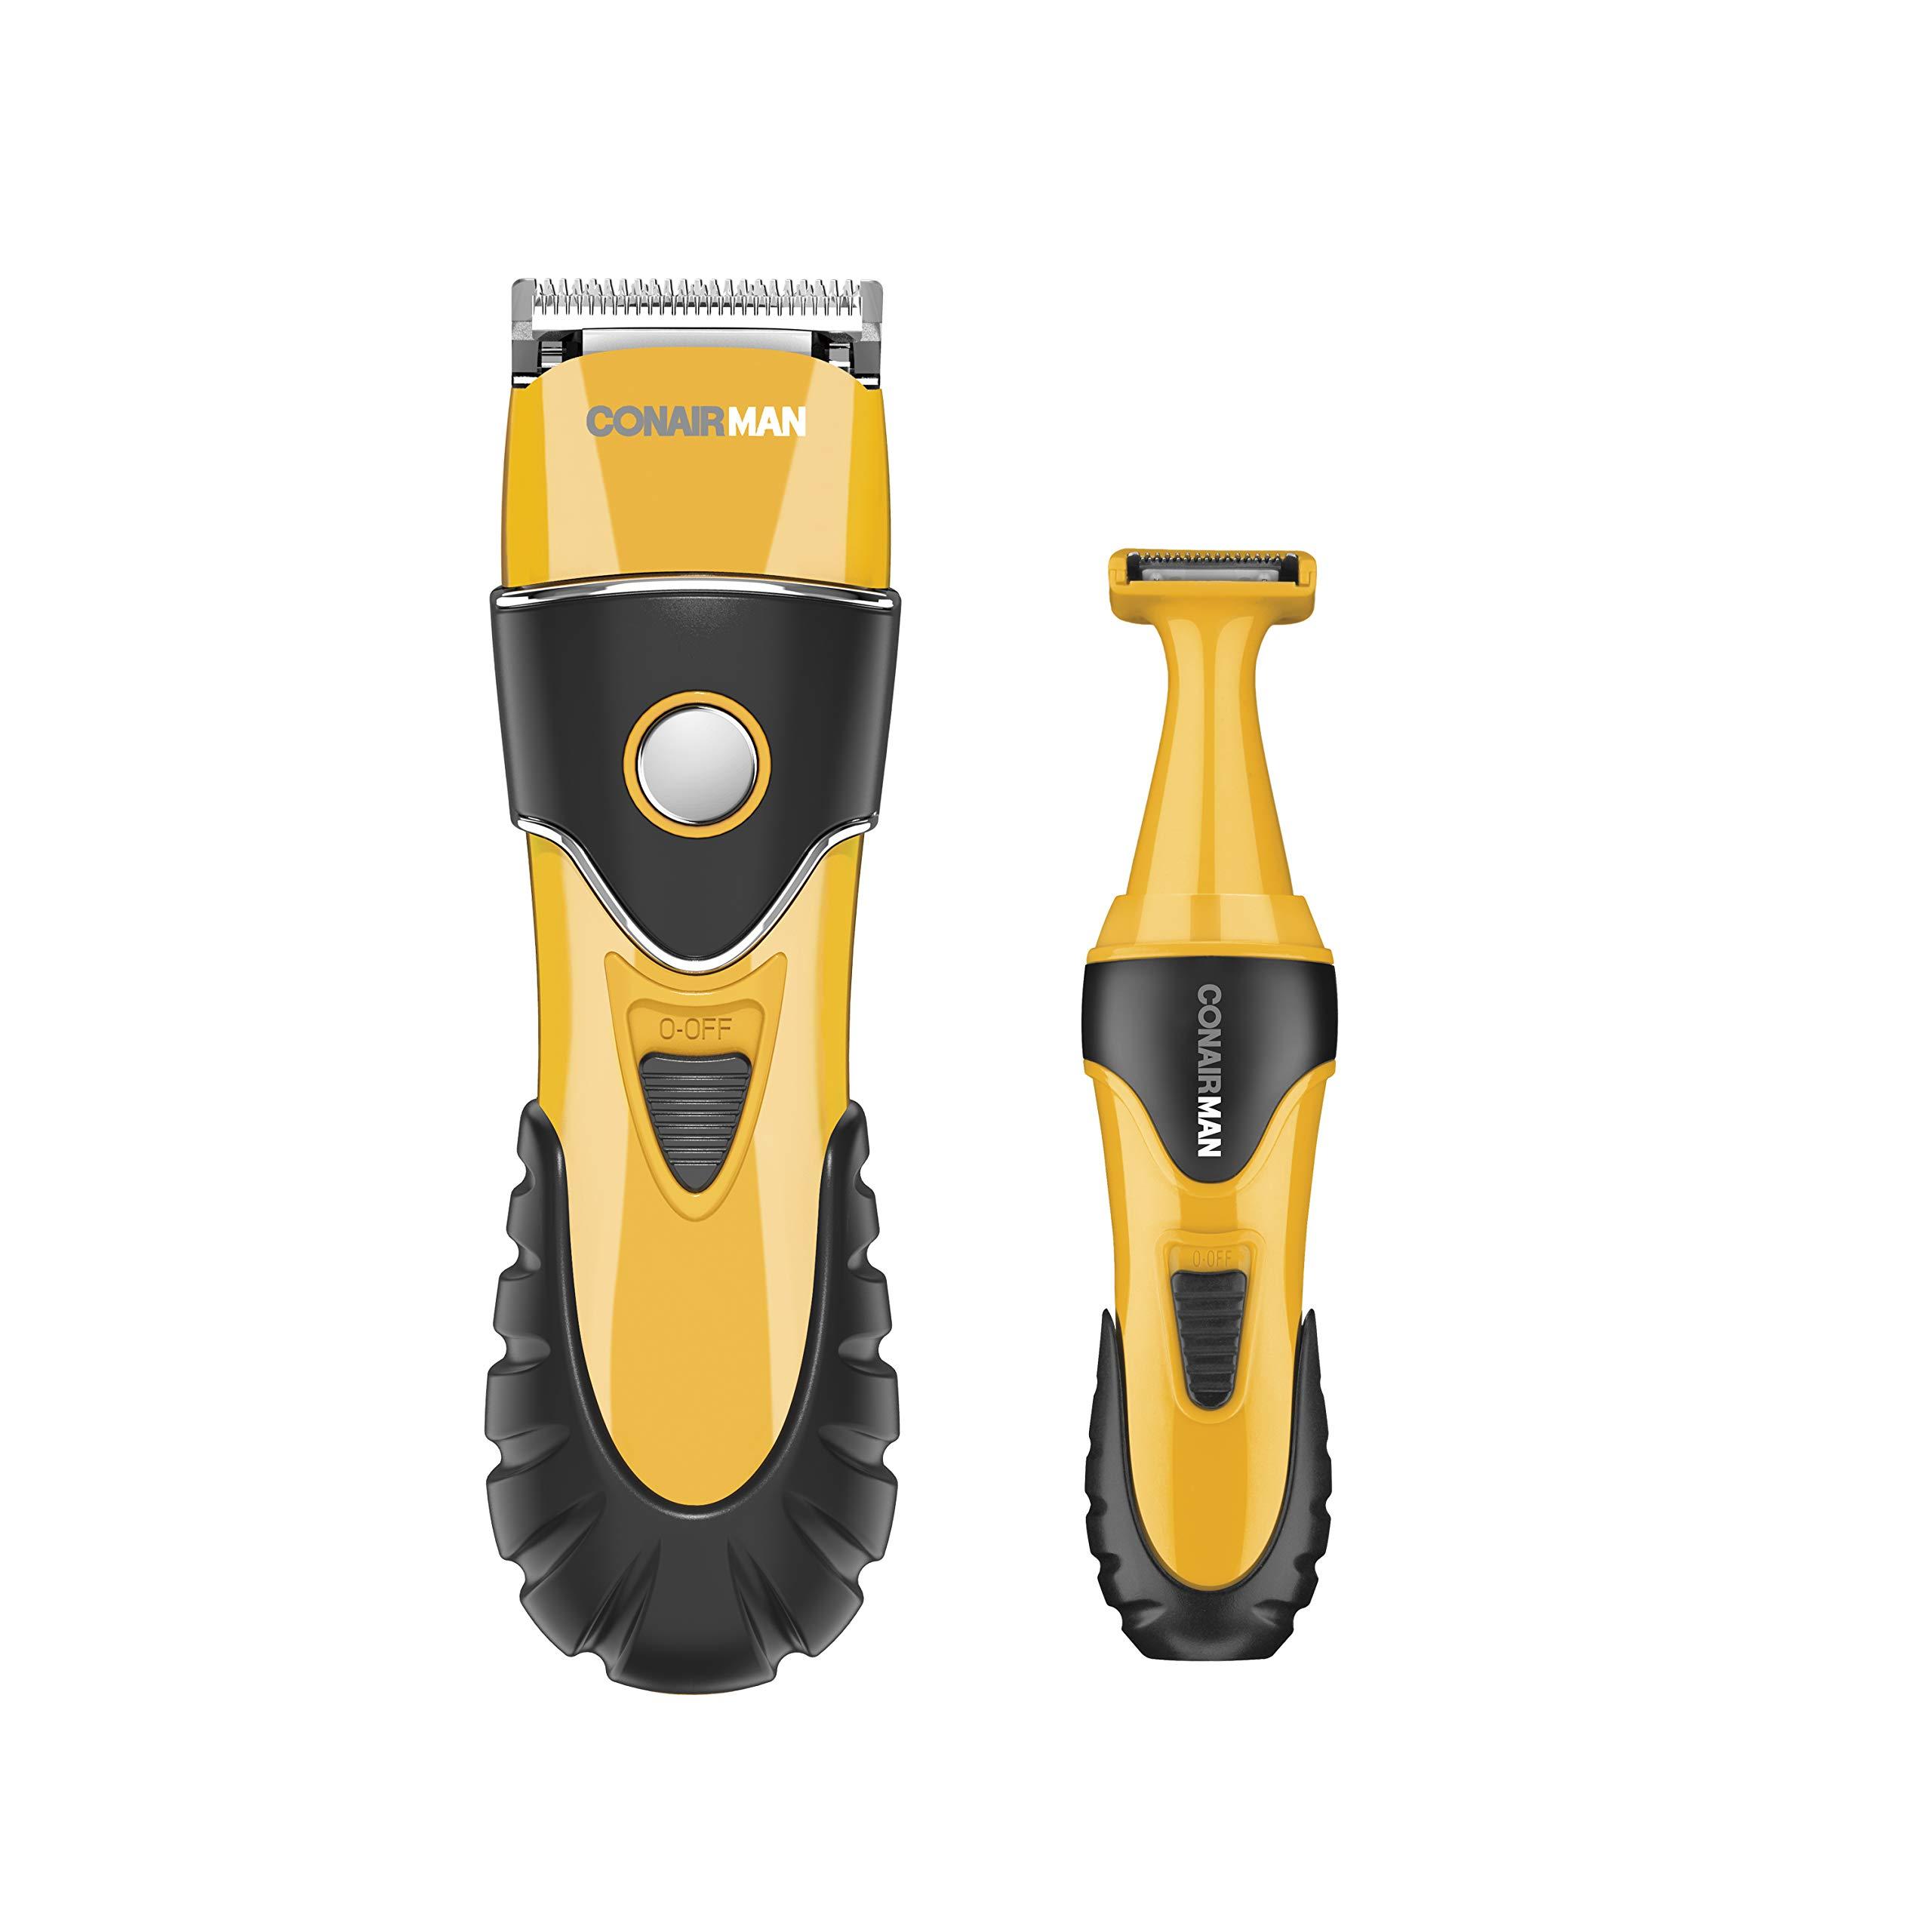 Conairman No-Slip Grip 20Piece Haircut Kit & Grooming Kit; Home Hair Cutting Kit, Trimmer, Body Groomer by Conair